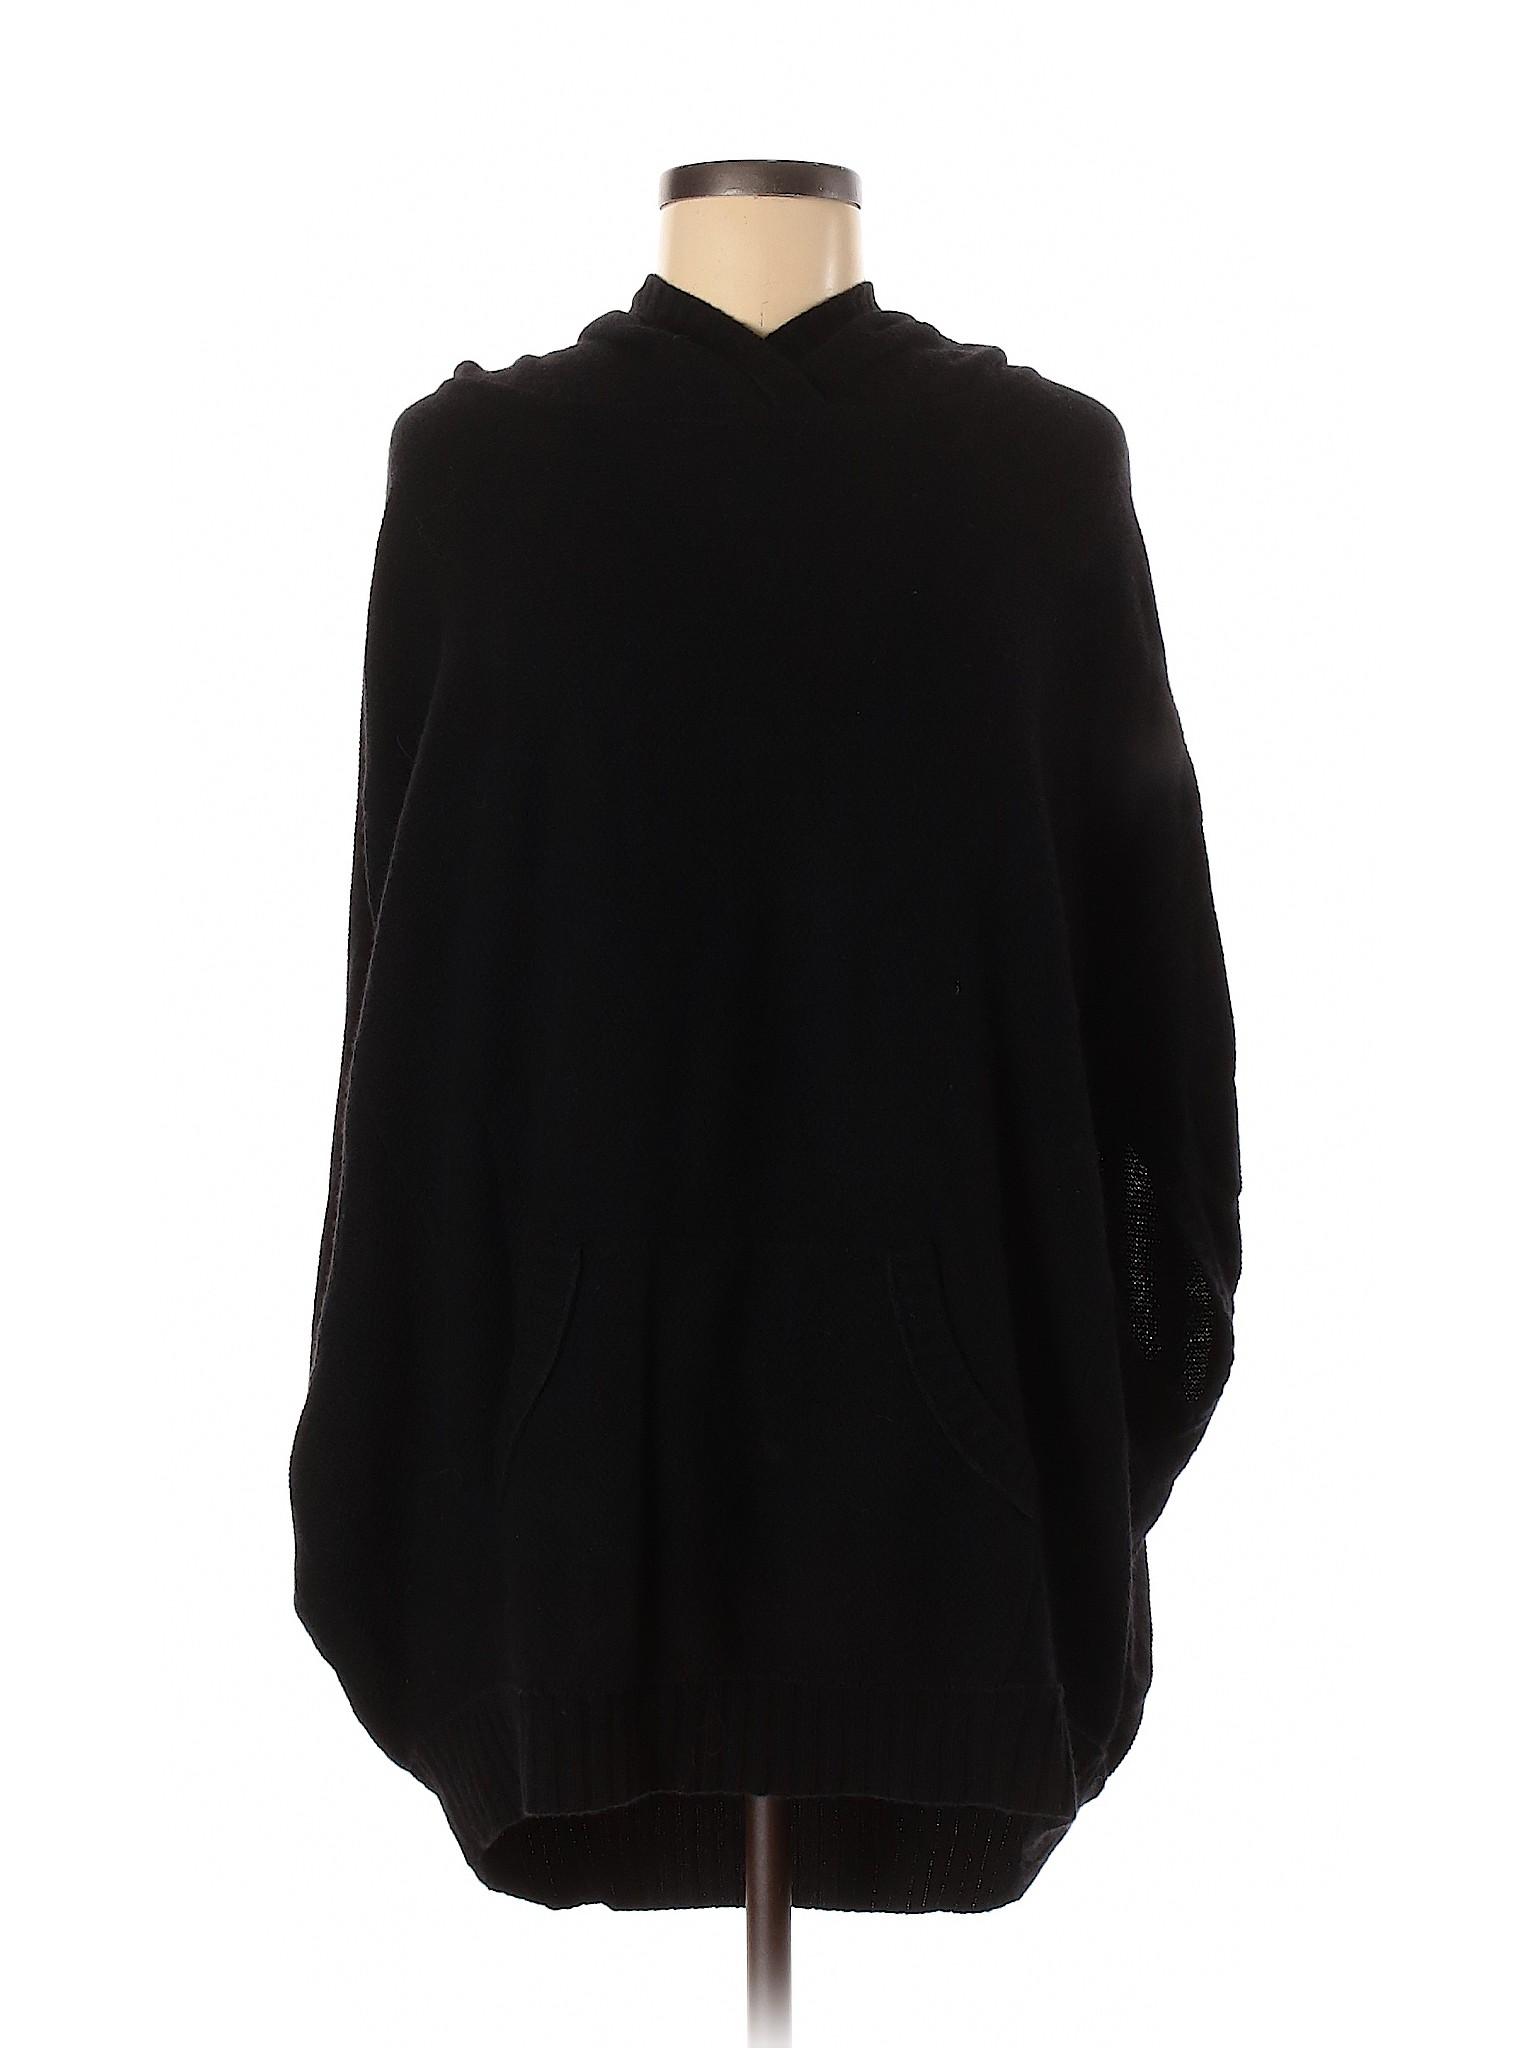 sale retailer b8c65 98fe6 Details about Donna Karan New York Women Black Cashmere Pullover Sweater Med